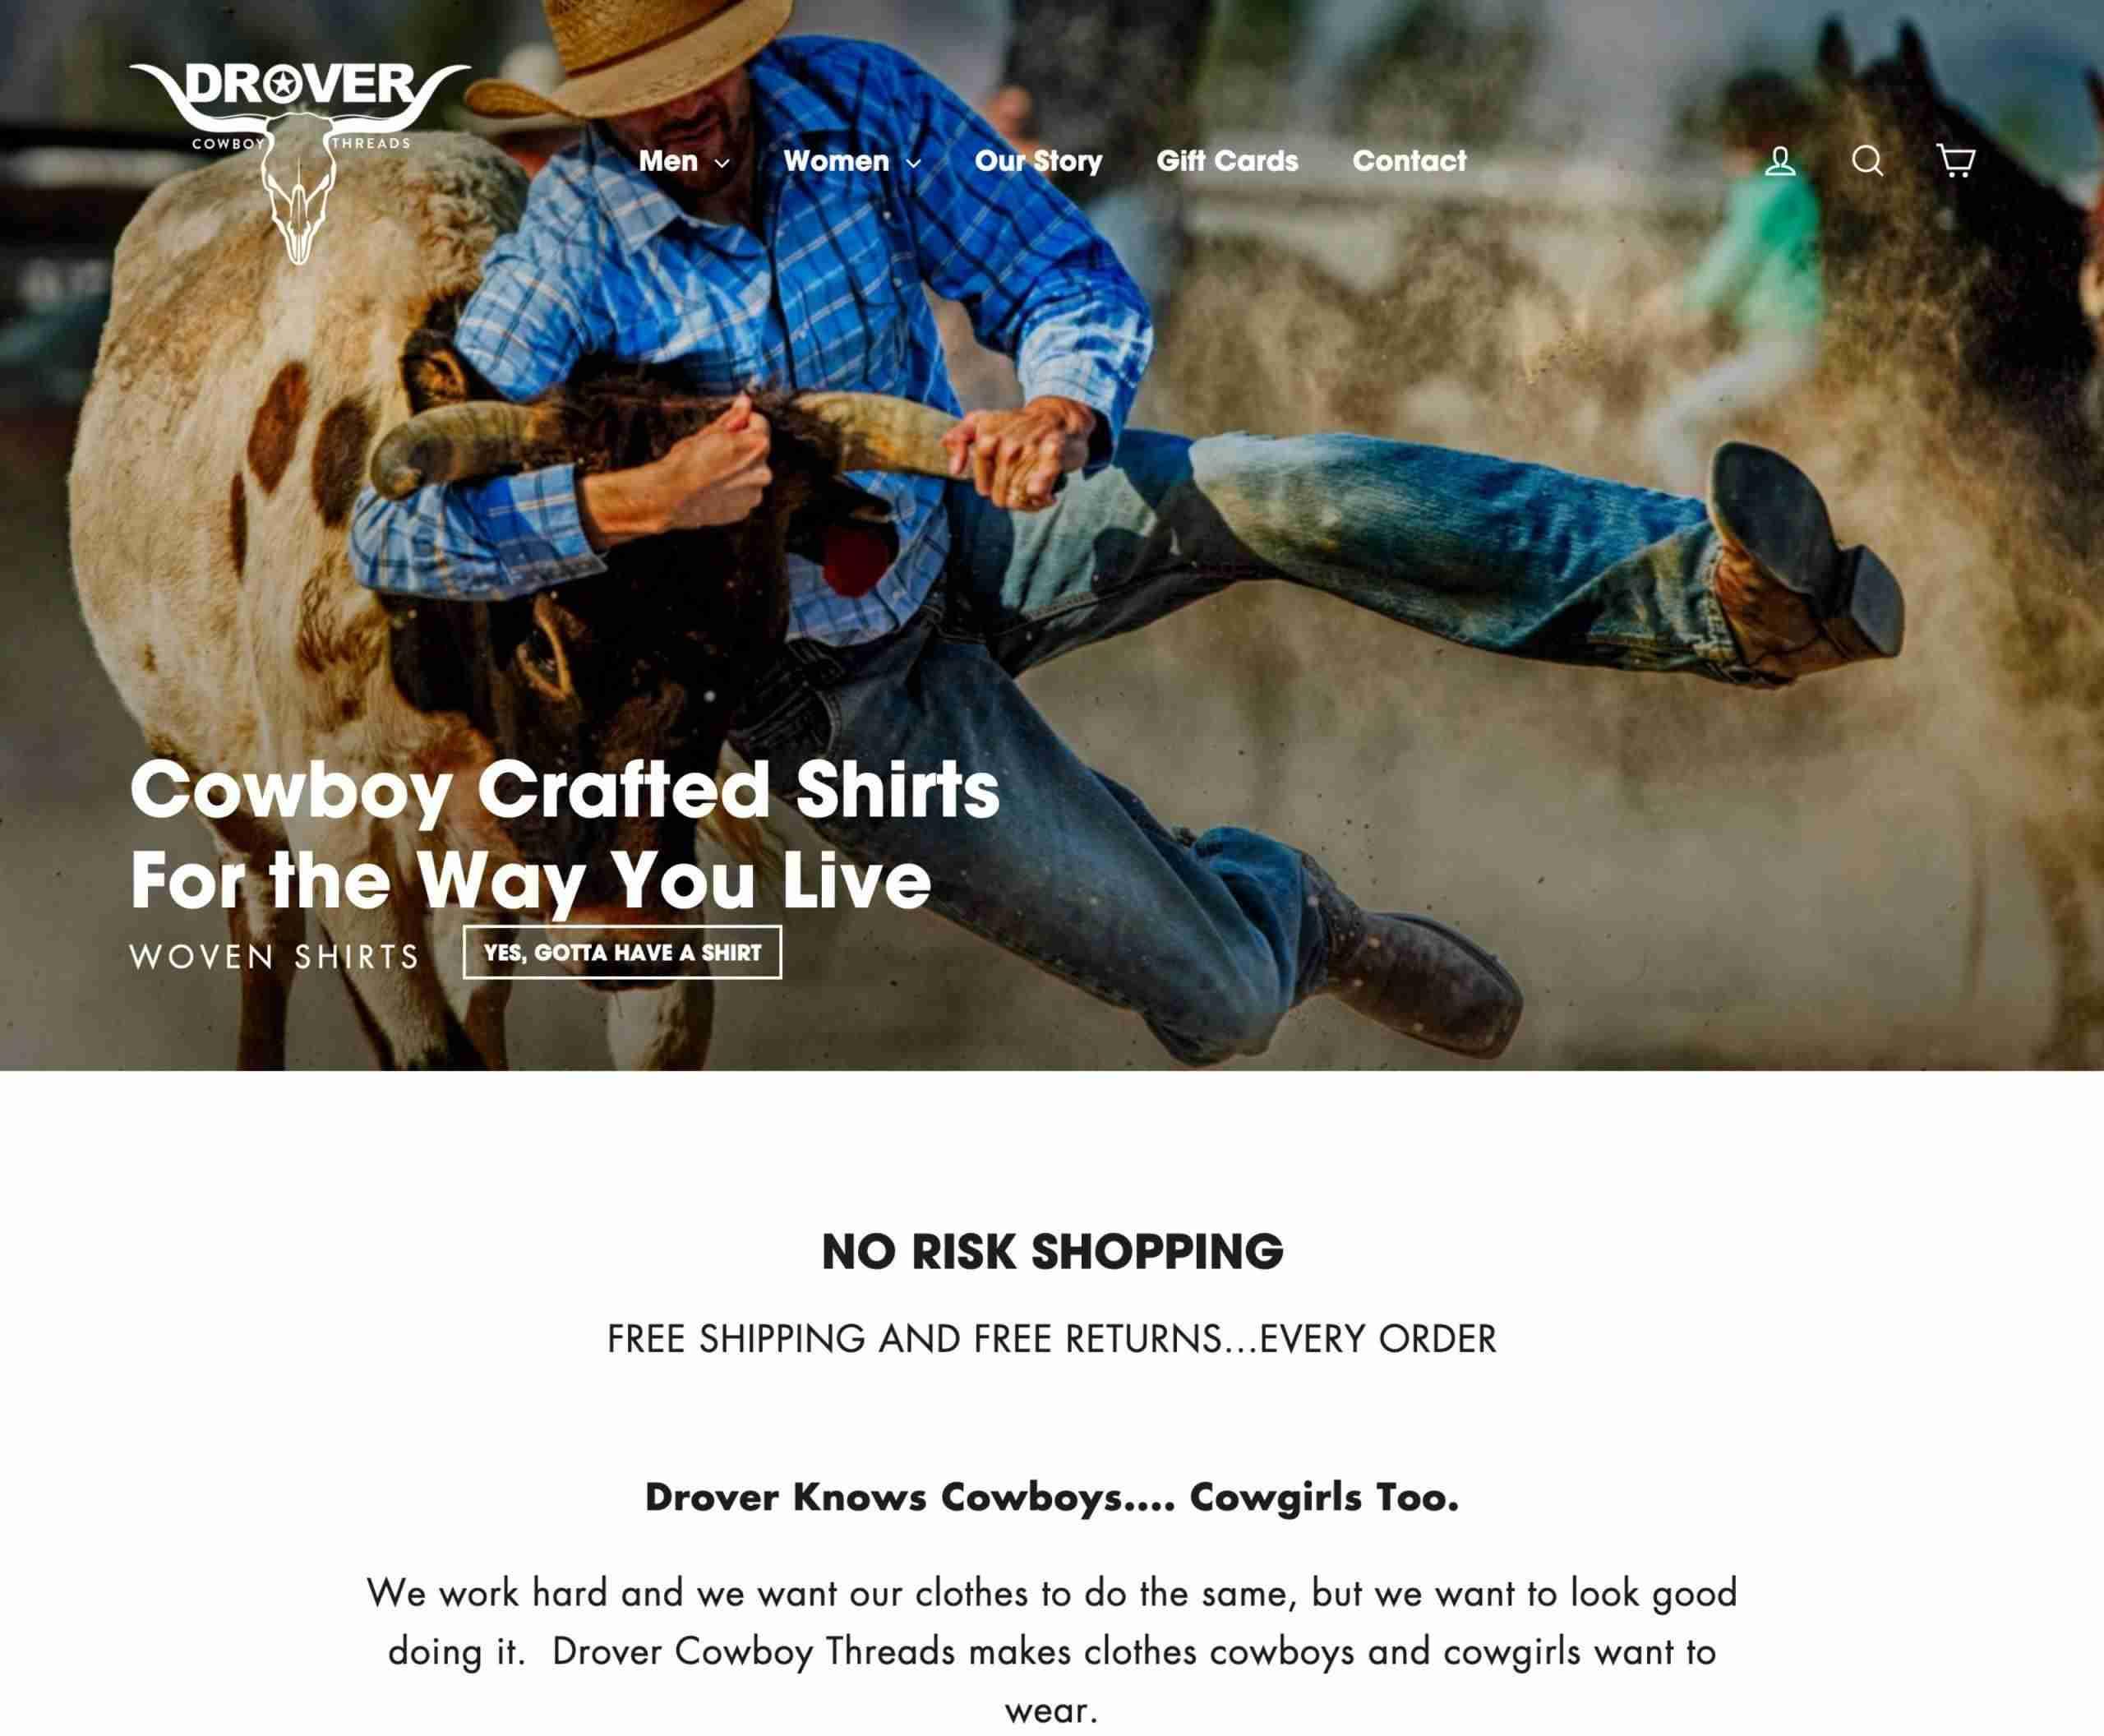 Drover Cowboy Threads